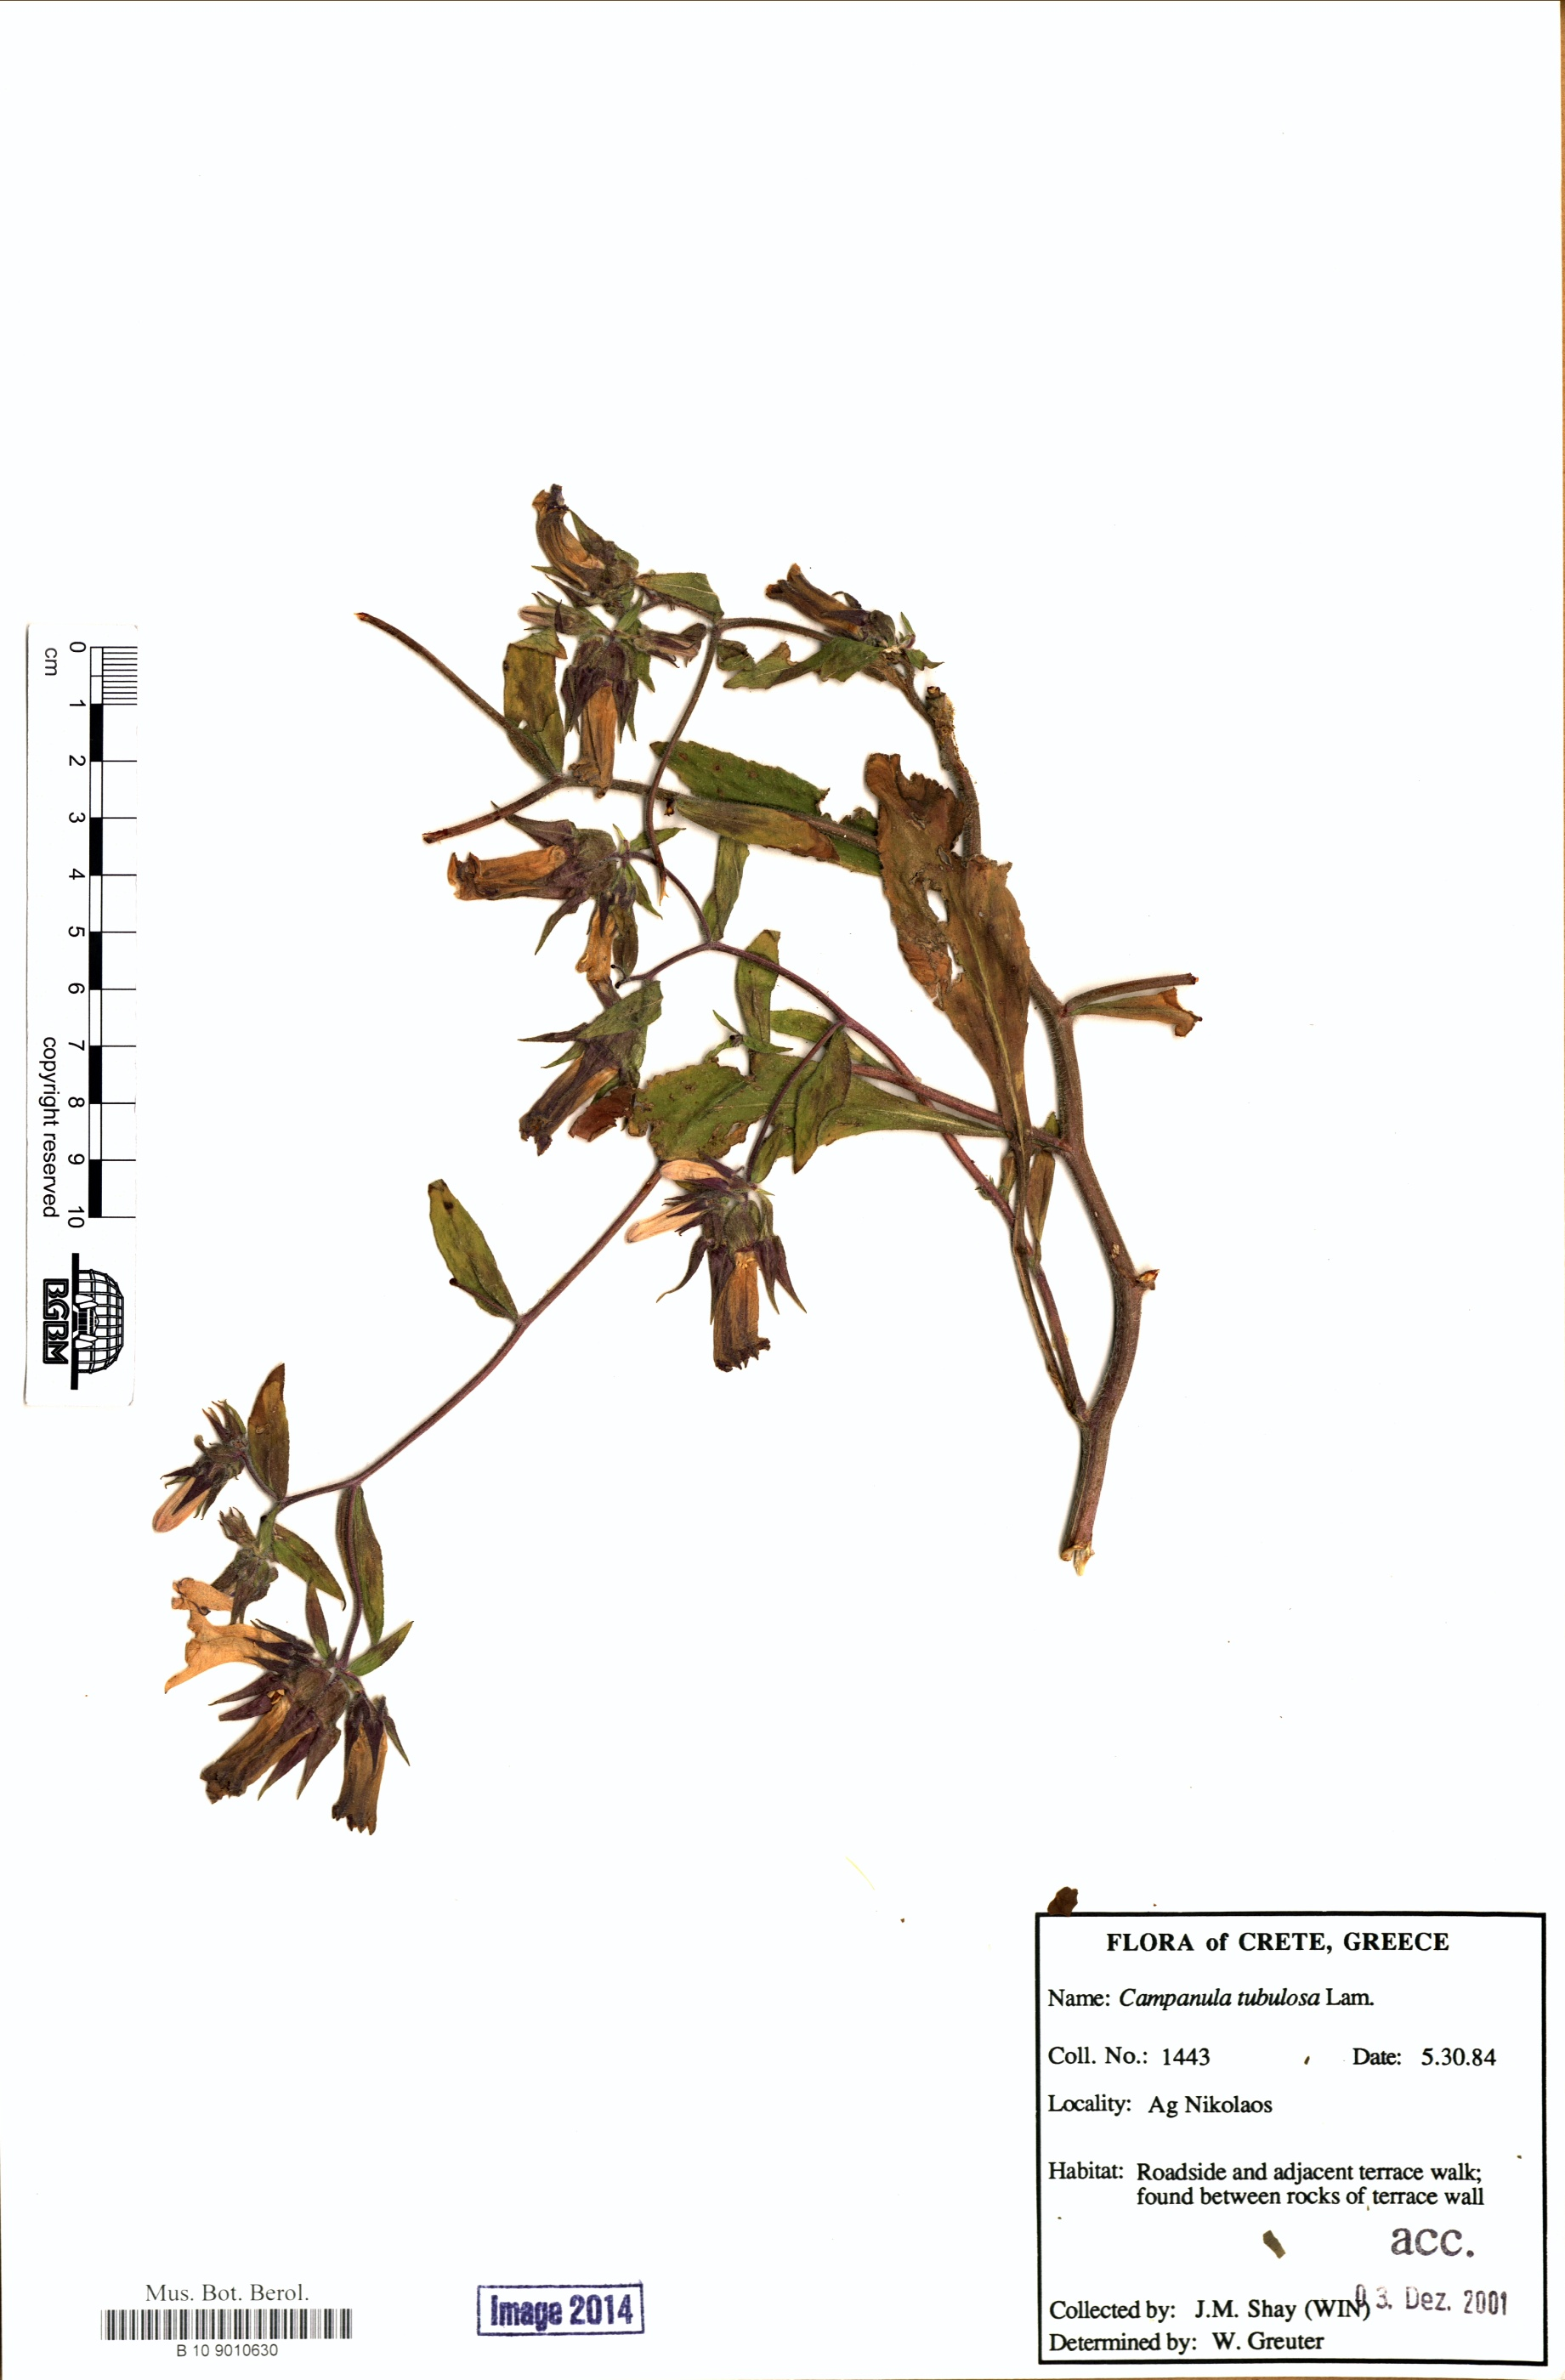 http://ww2.bgbm.org/herbarium/images/B/10/90/10/63/B_10_9010630.jpg